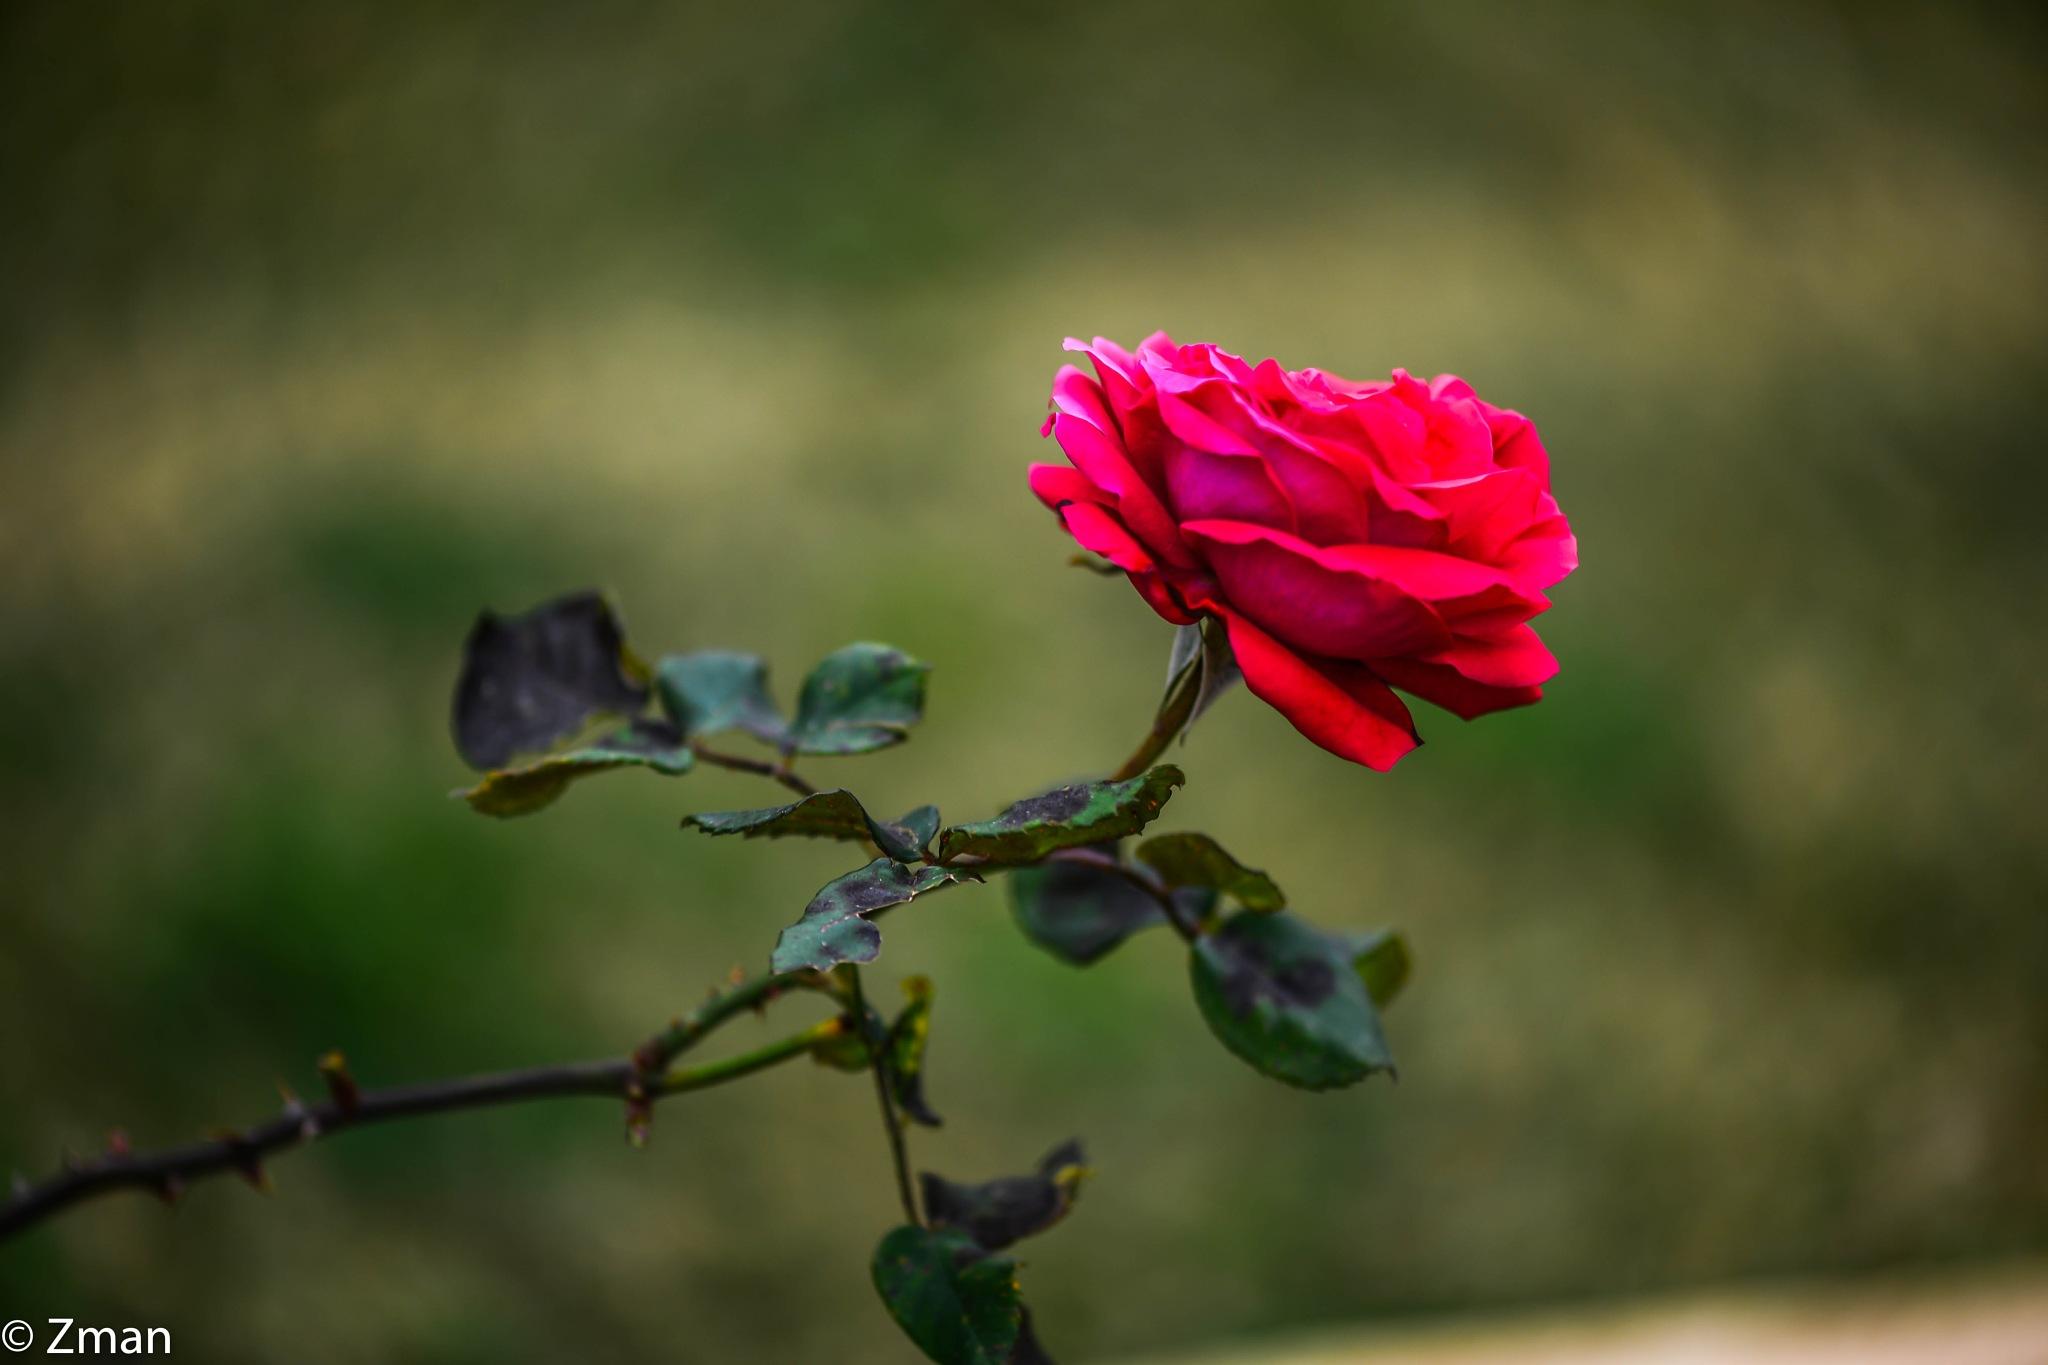 Red Rose by muhammad.nasser.963